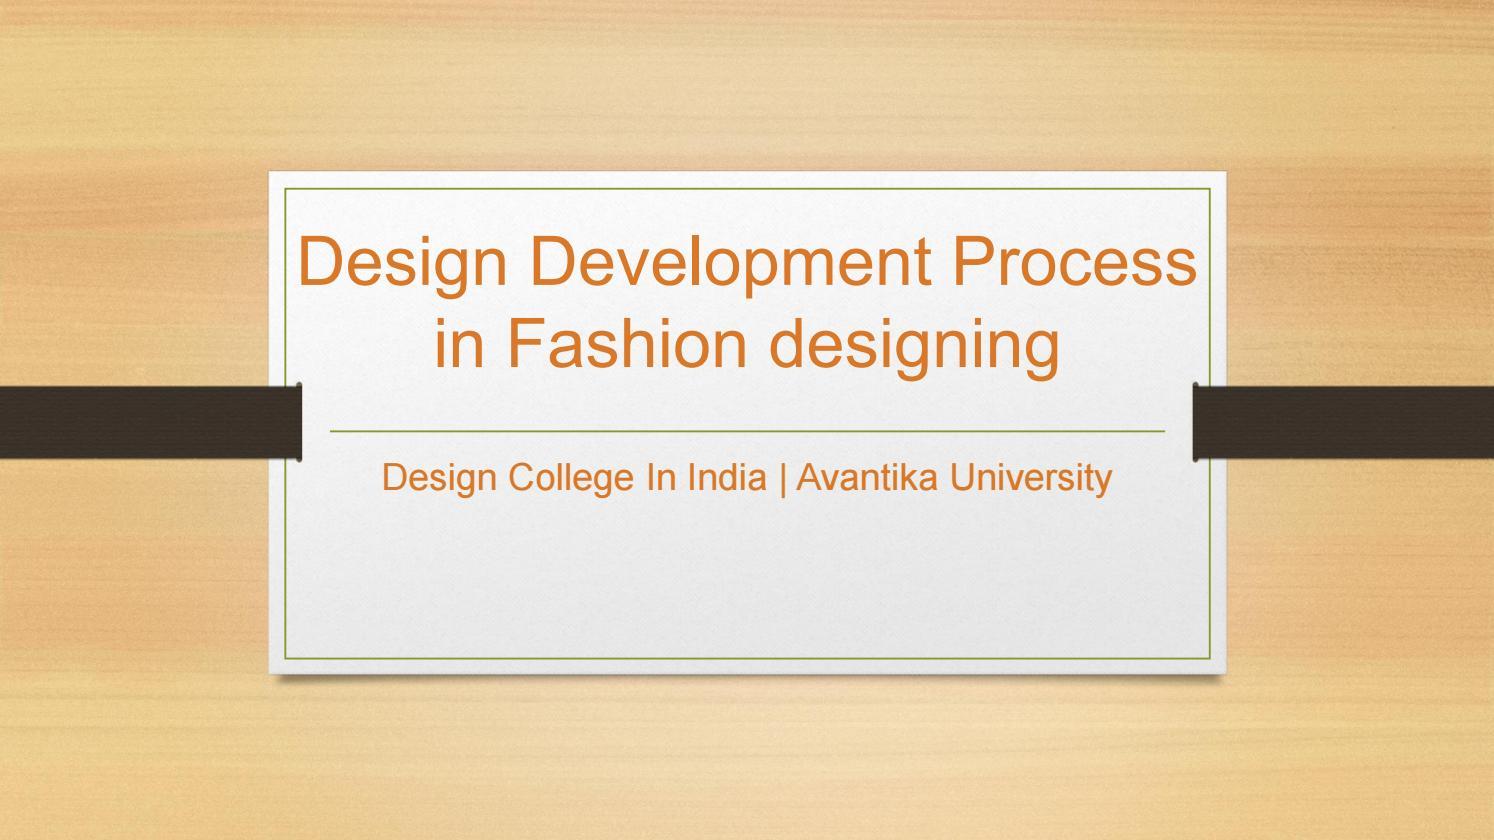 Design Process In Fashion Designing Avantika University By Avantika University Issuu